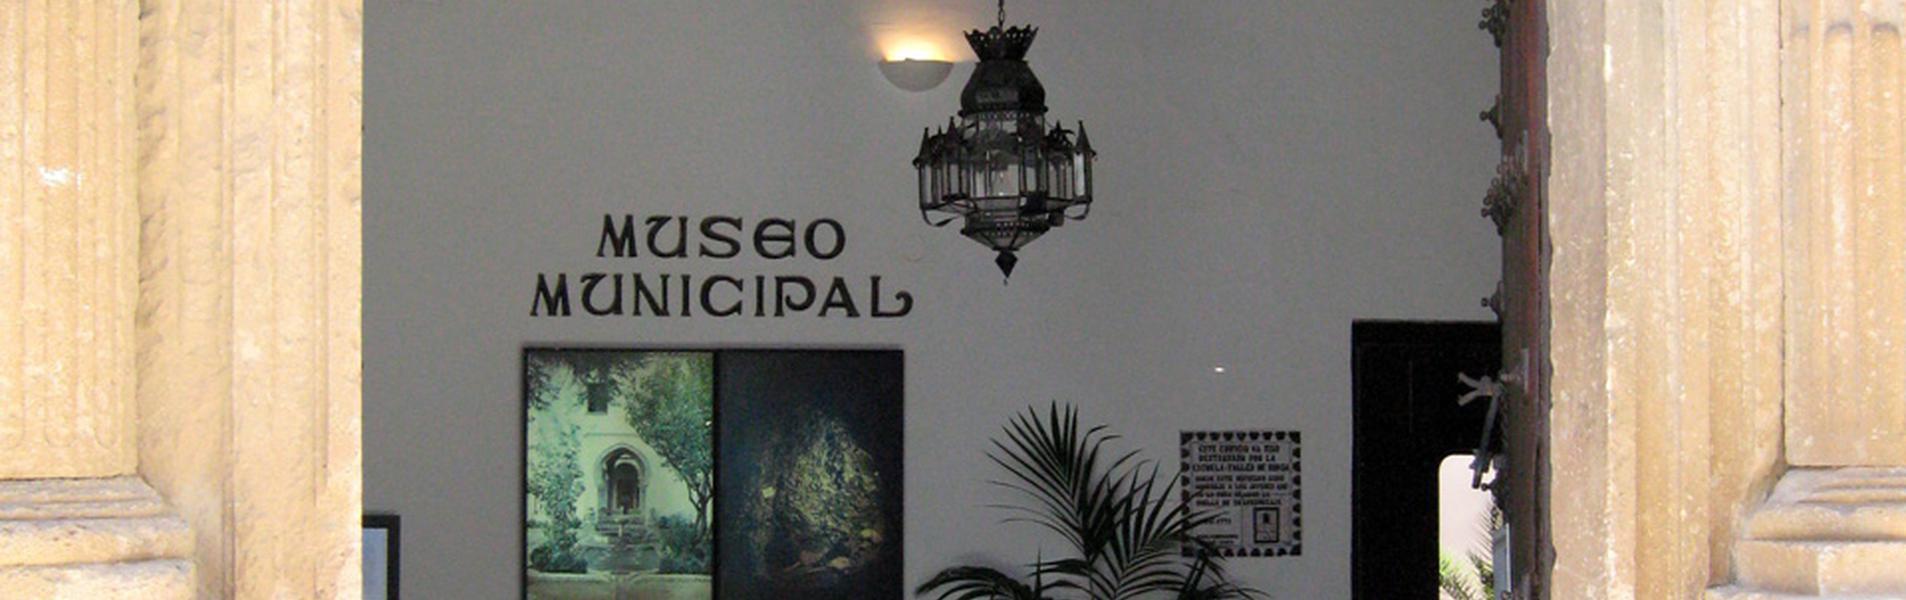 Museo Municipal de Ronda